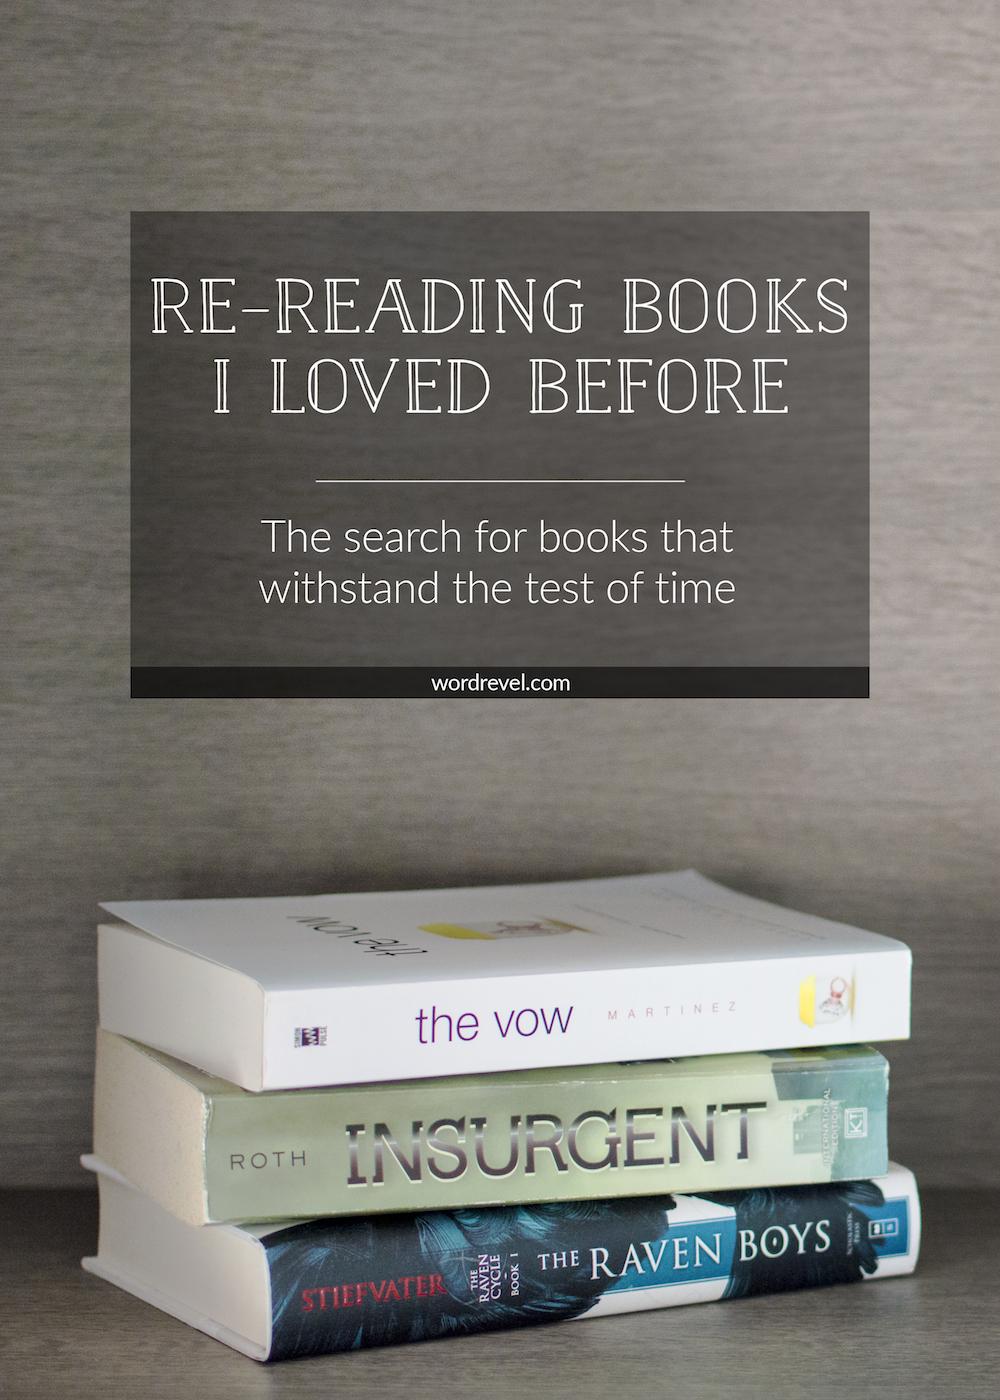 Re-reading Books I Loved Before